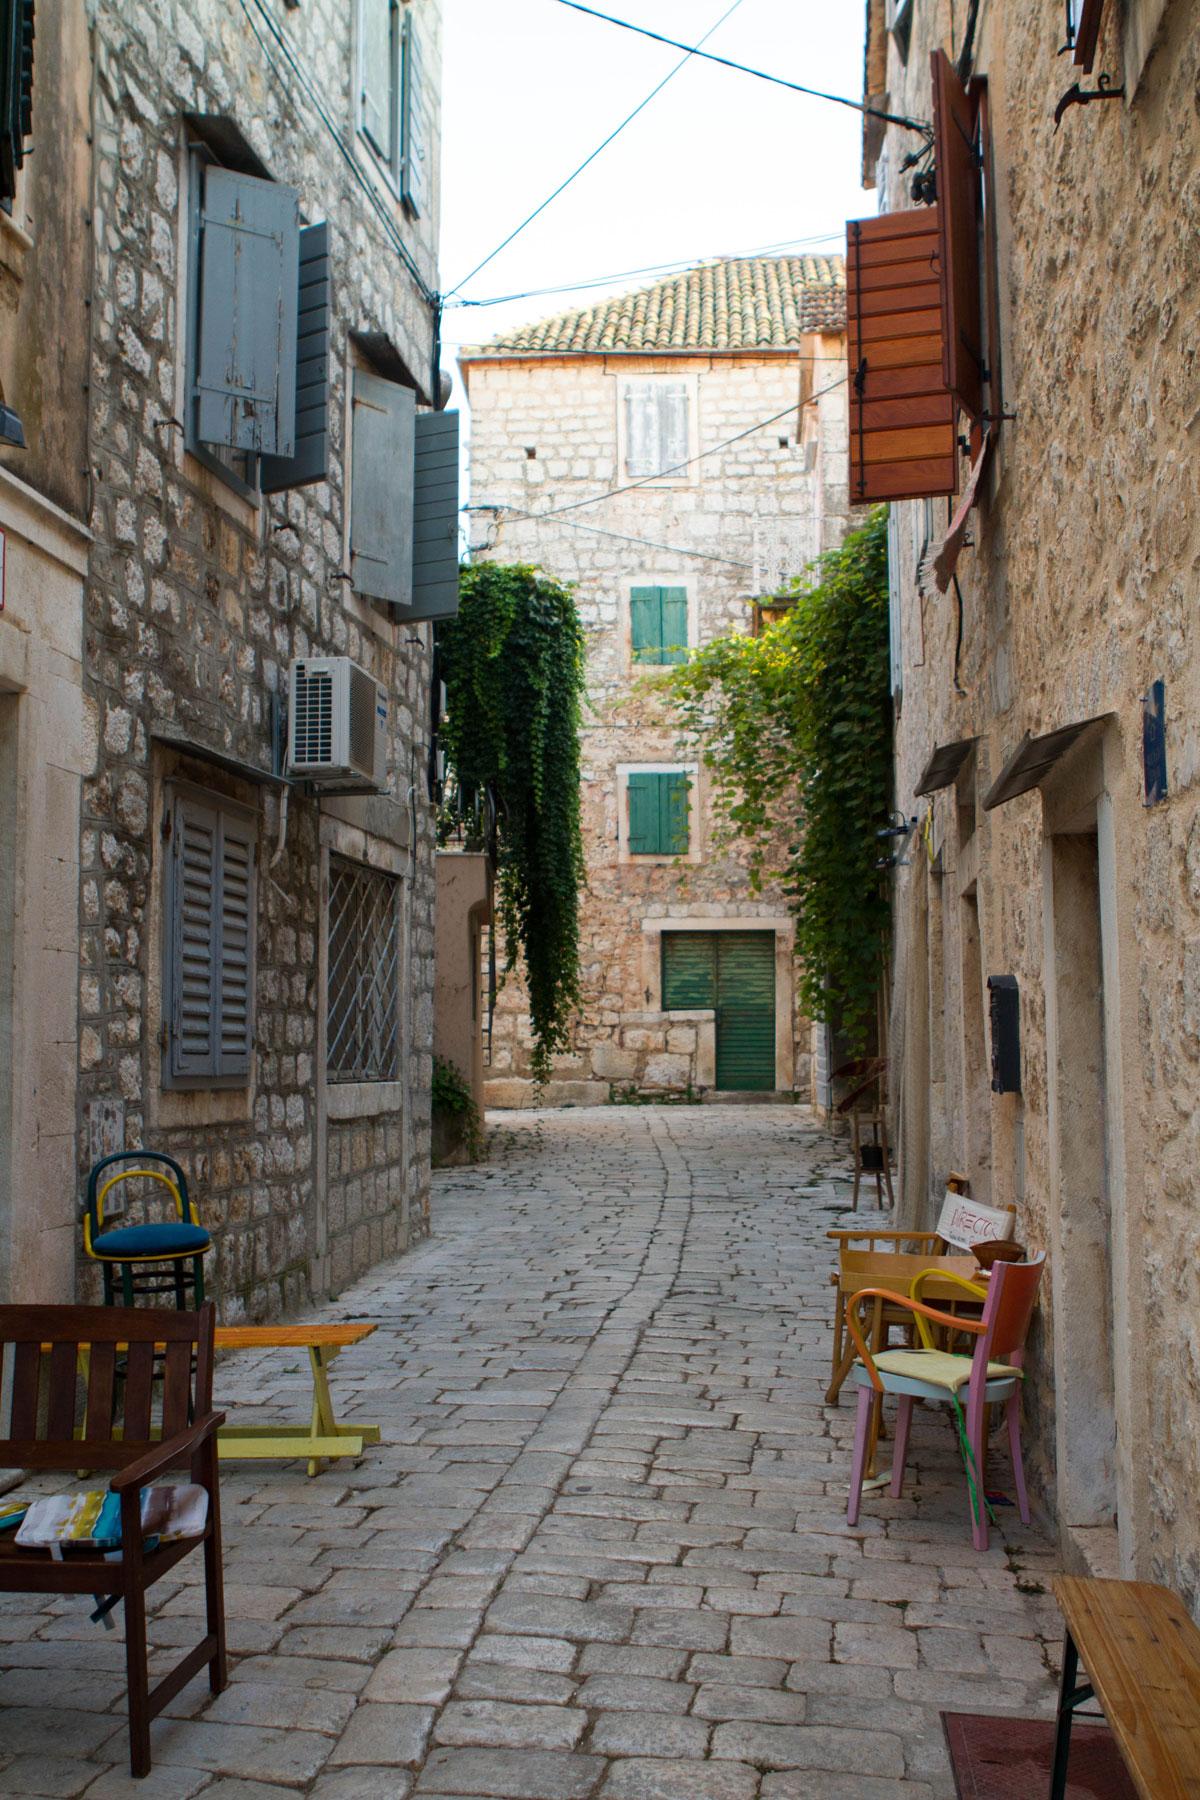 Streets-of-Stari-Grad_Hvar-(photo-by-Ste